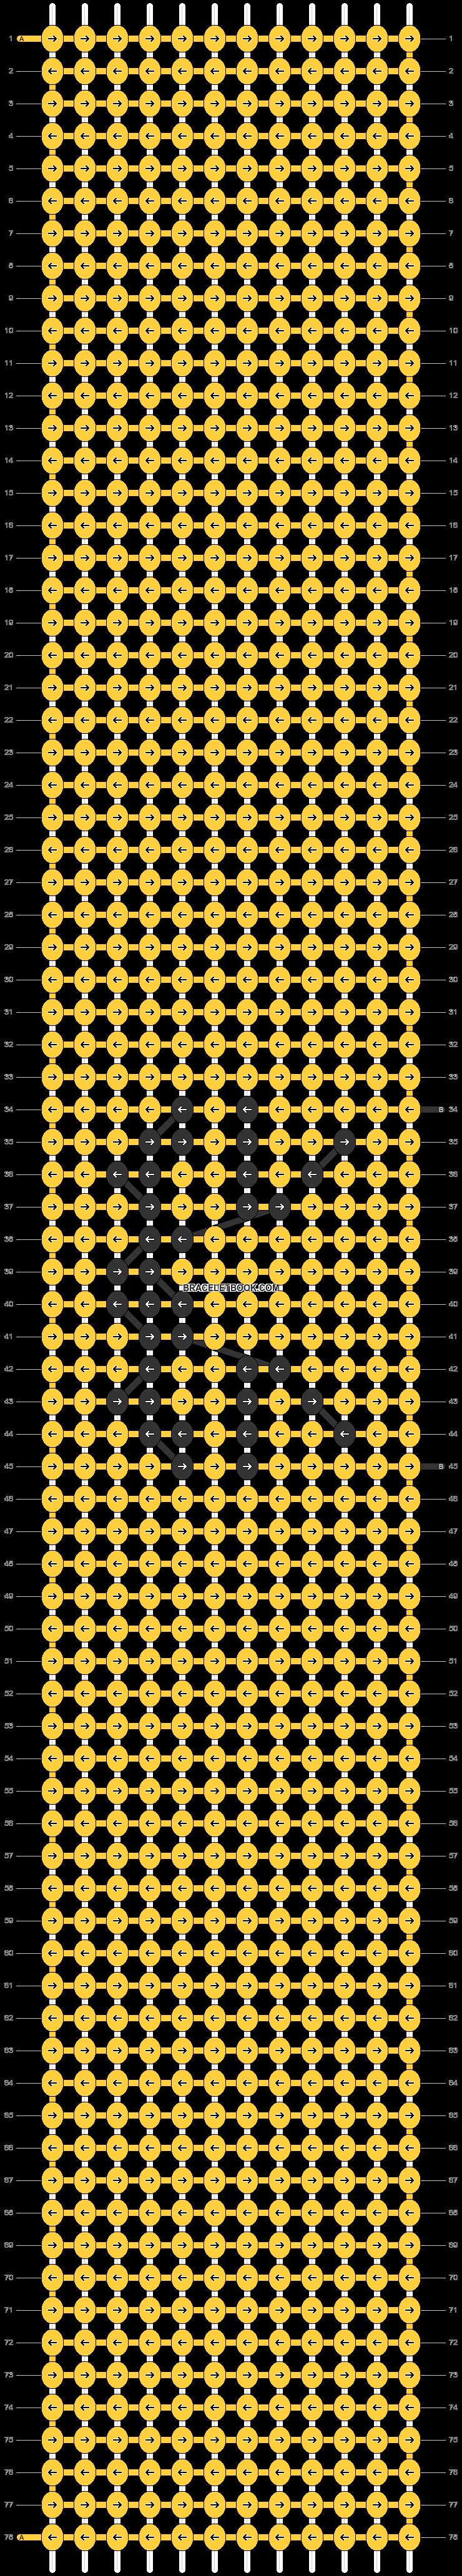 Alpha pattern #58837 pattern